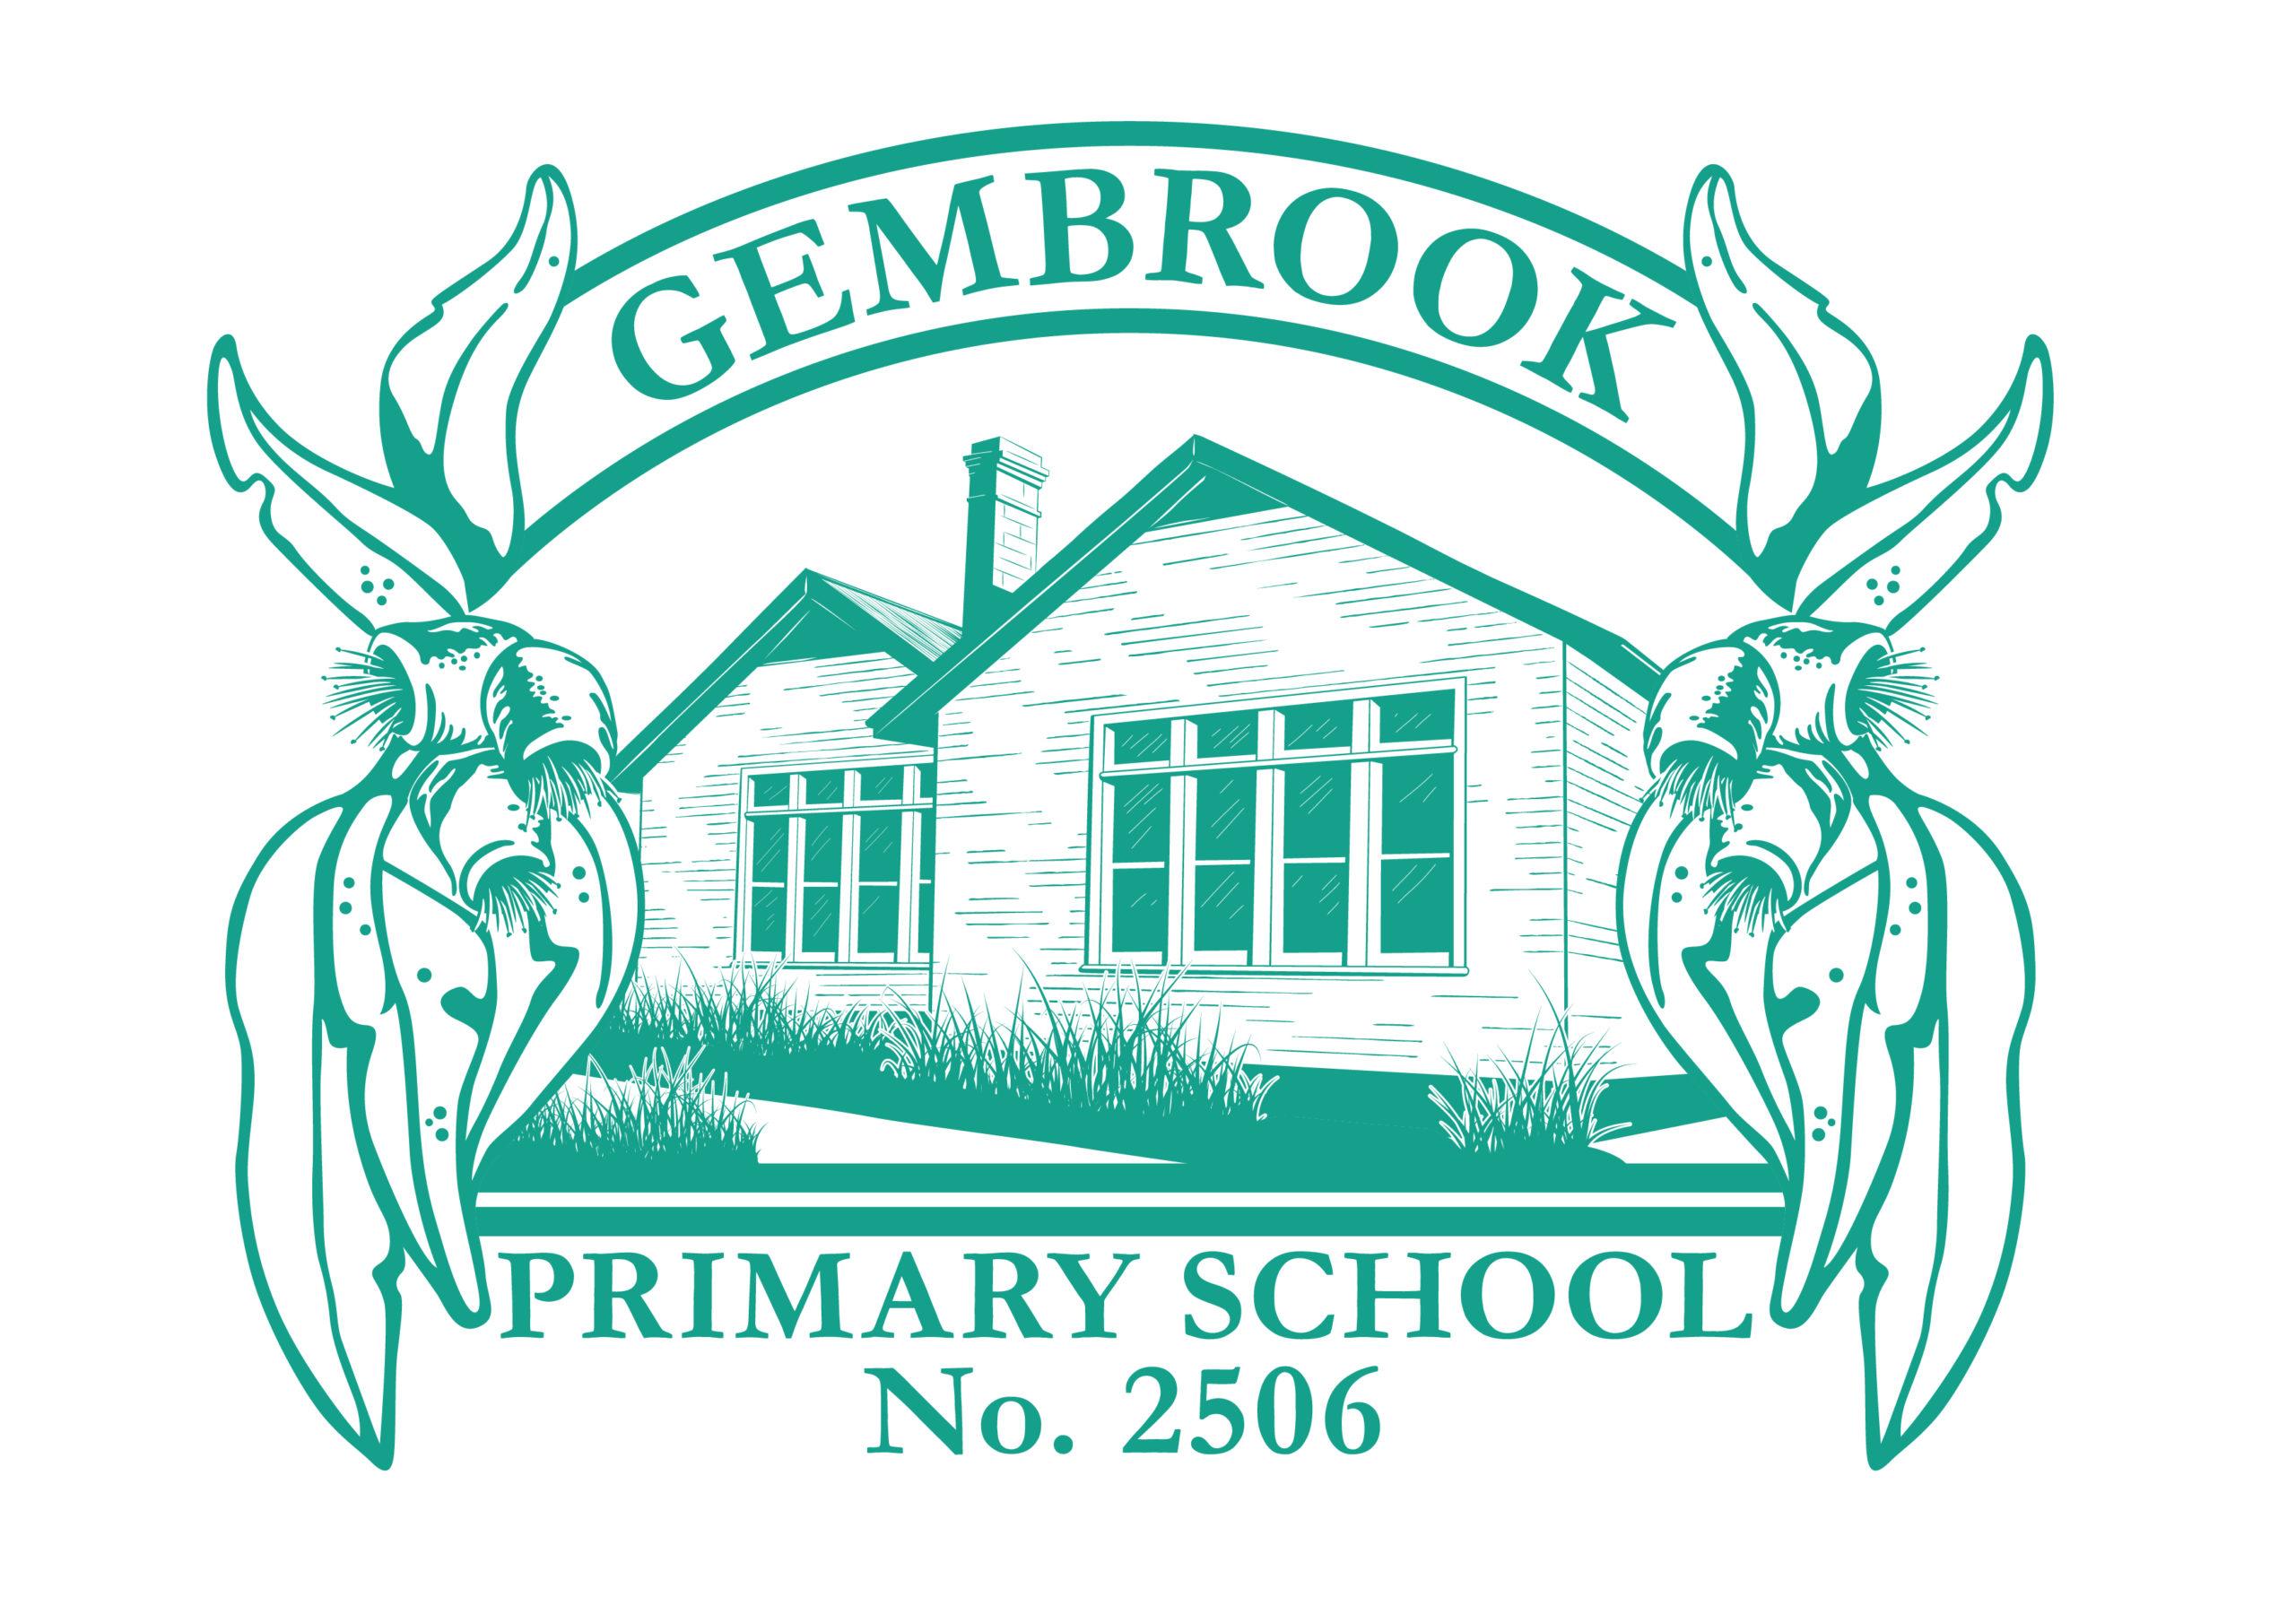 Gembrook Primary School